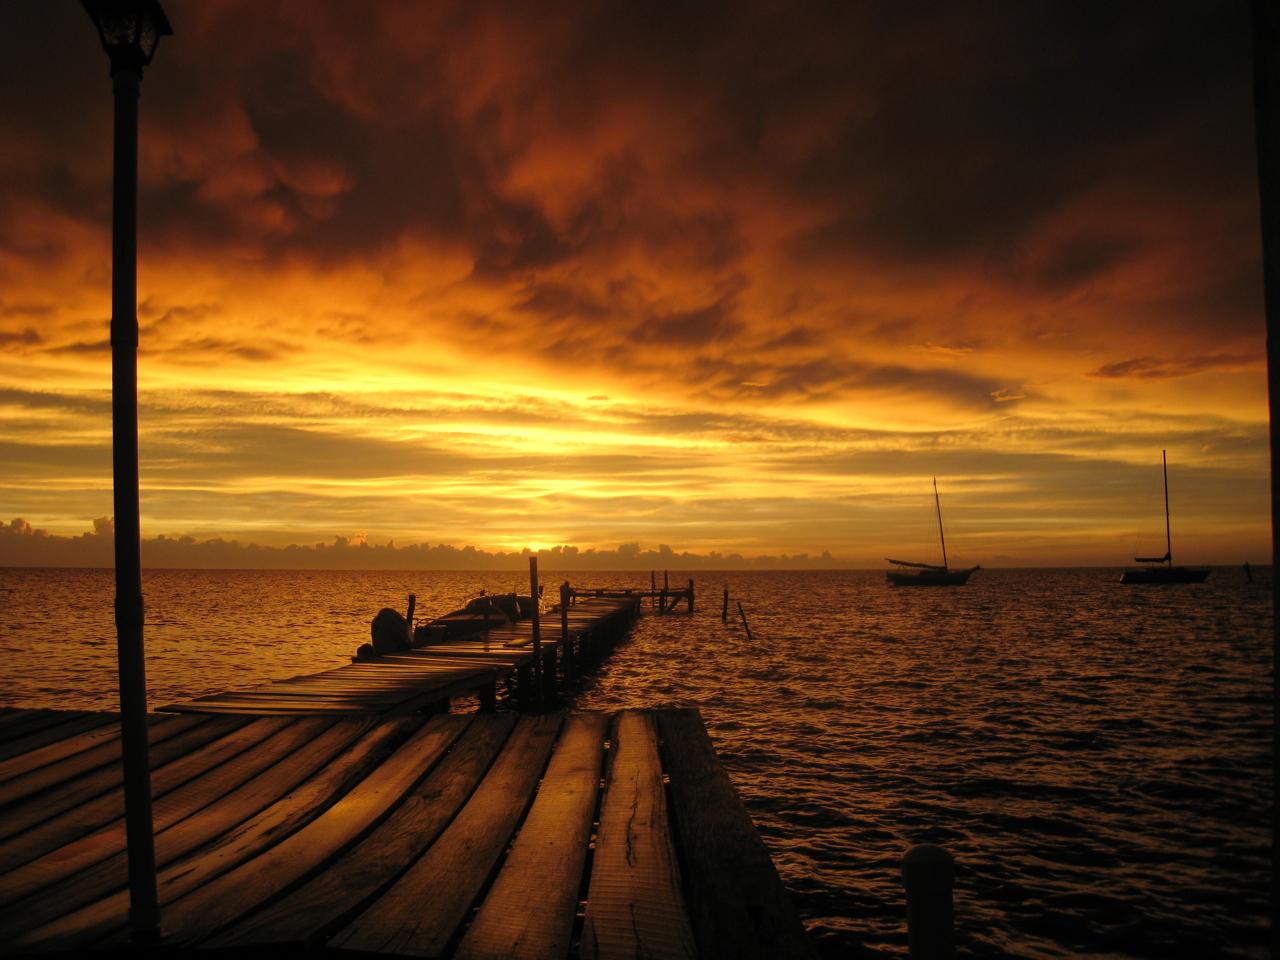 Sunset at Neil & Molly's Pier, Caye Caulker, Belize, CA